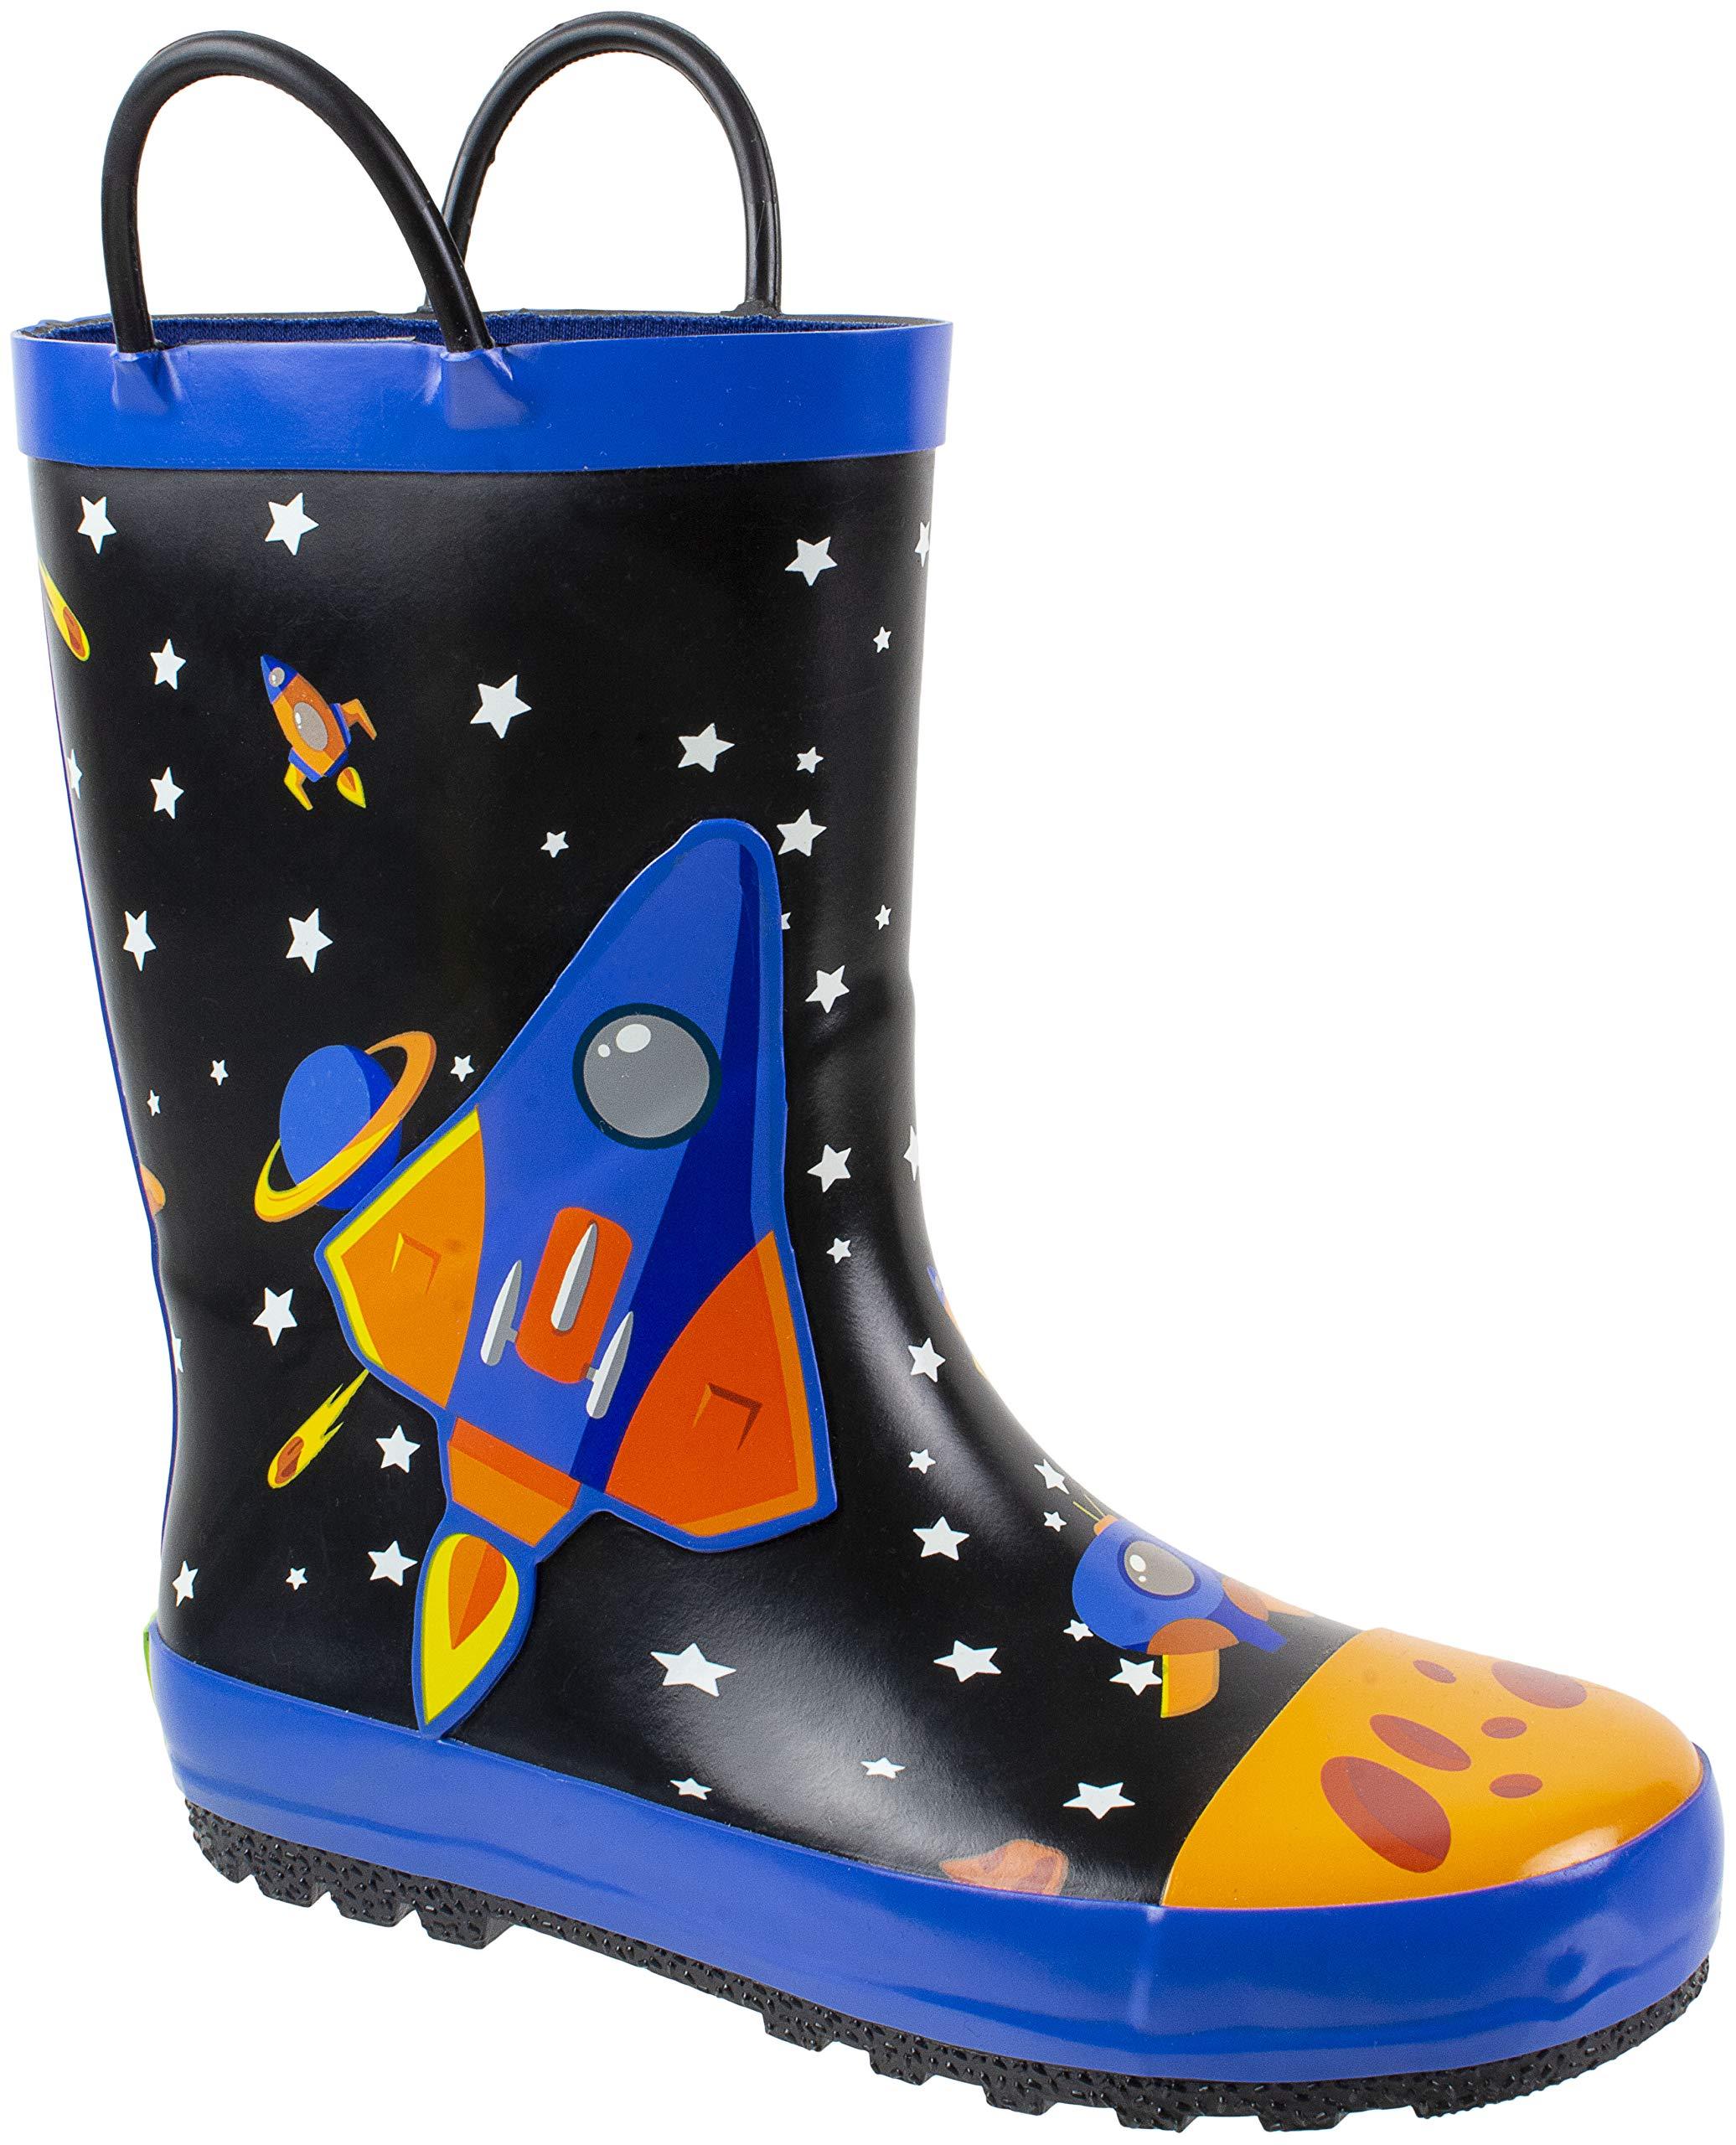 Rainbow Daze Kids Rain Boots Spaceship,Astronaut Galaxy Print,Waterproof 100% Rubber,Little Kid Size 9/10, Black Blue